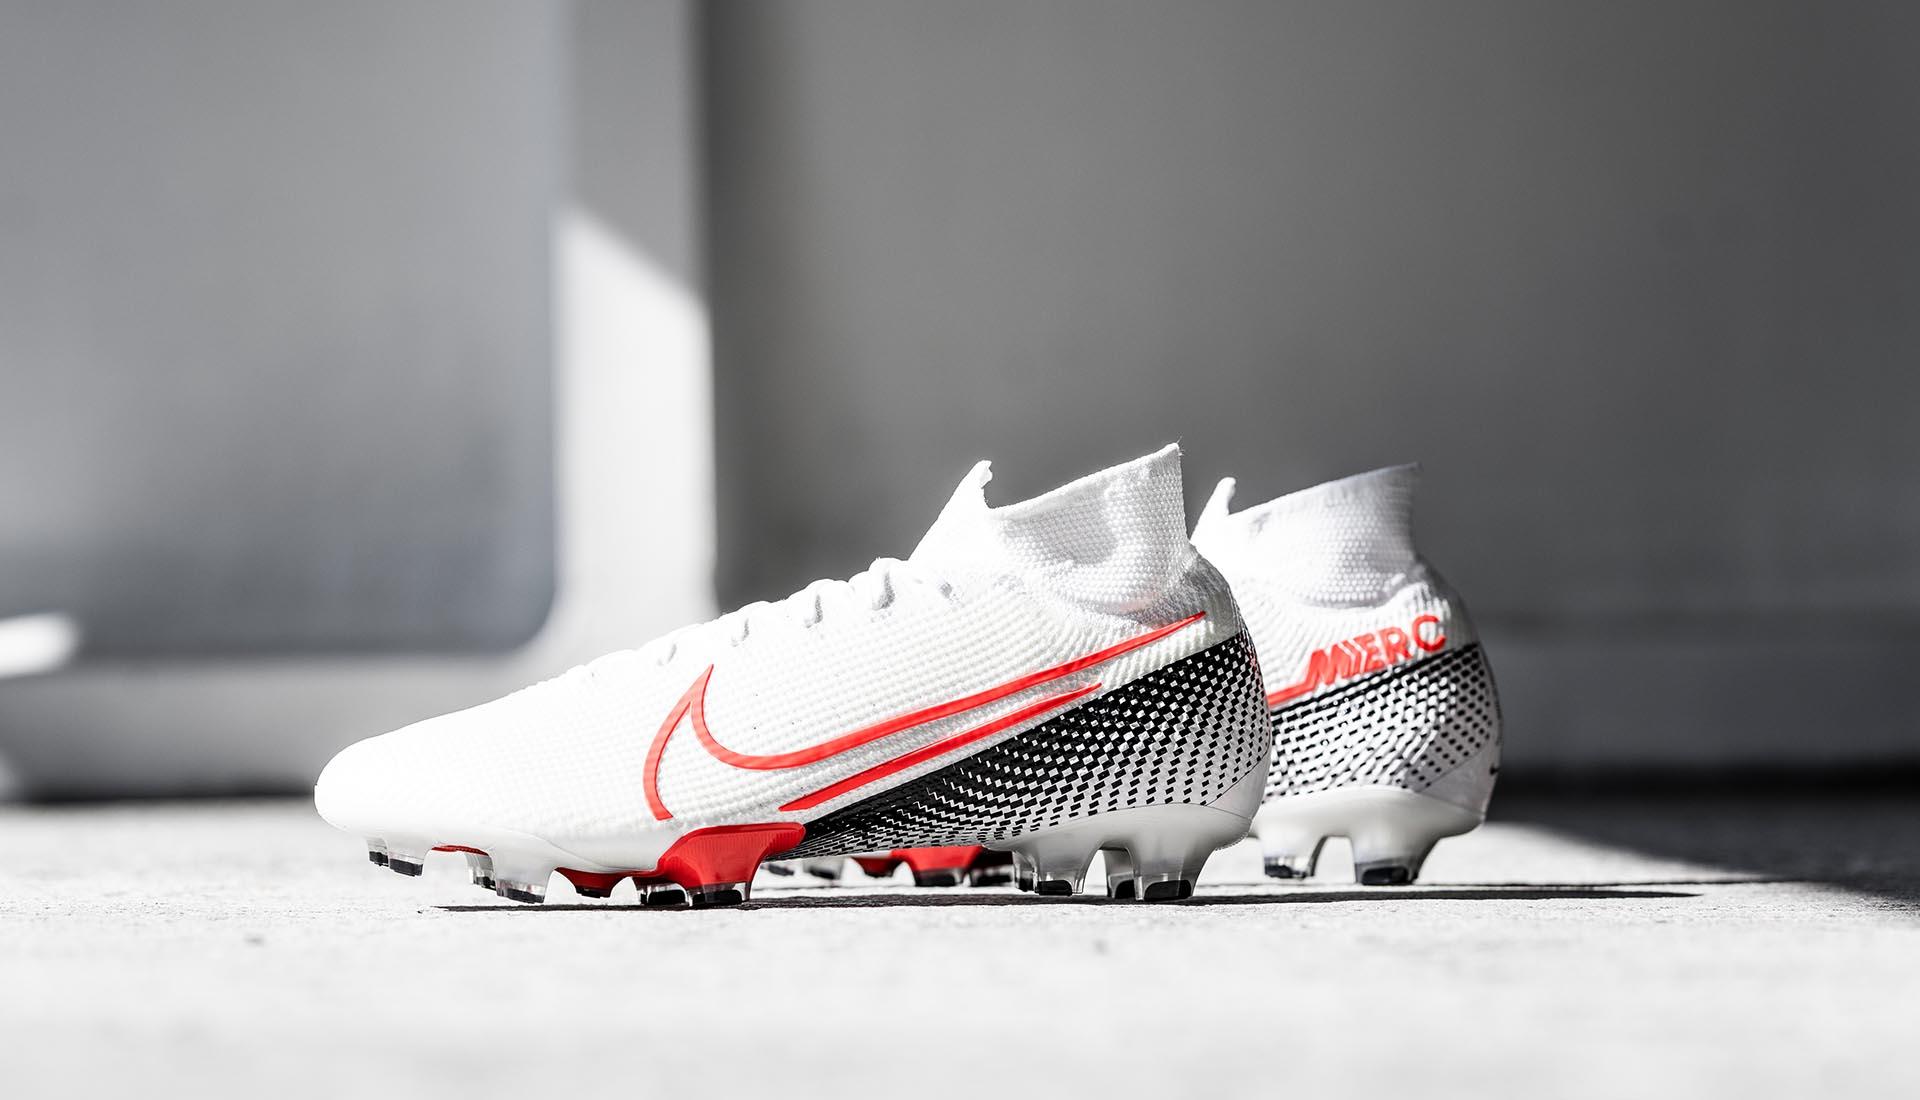 Bo suu tap giay da bong Nike Future lab 2 (II) nam 2020 (16)